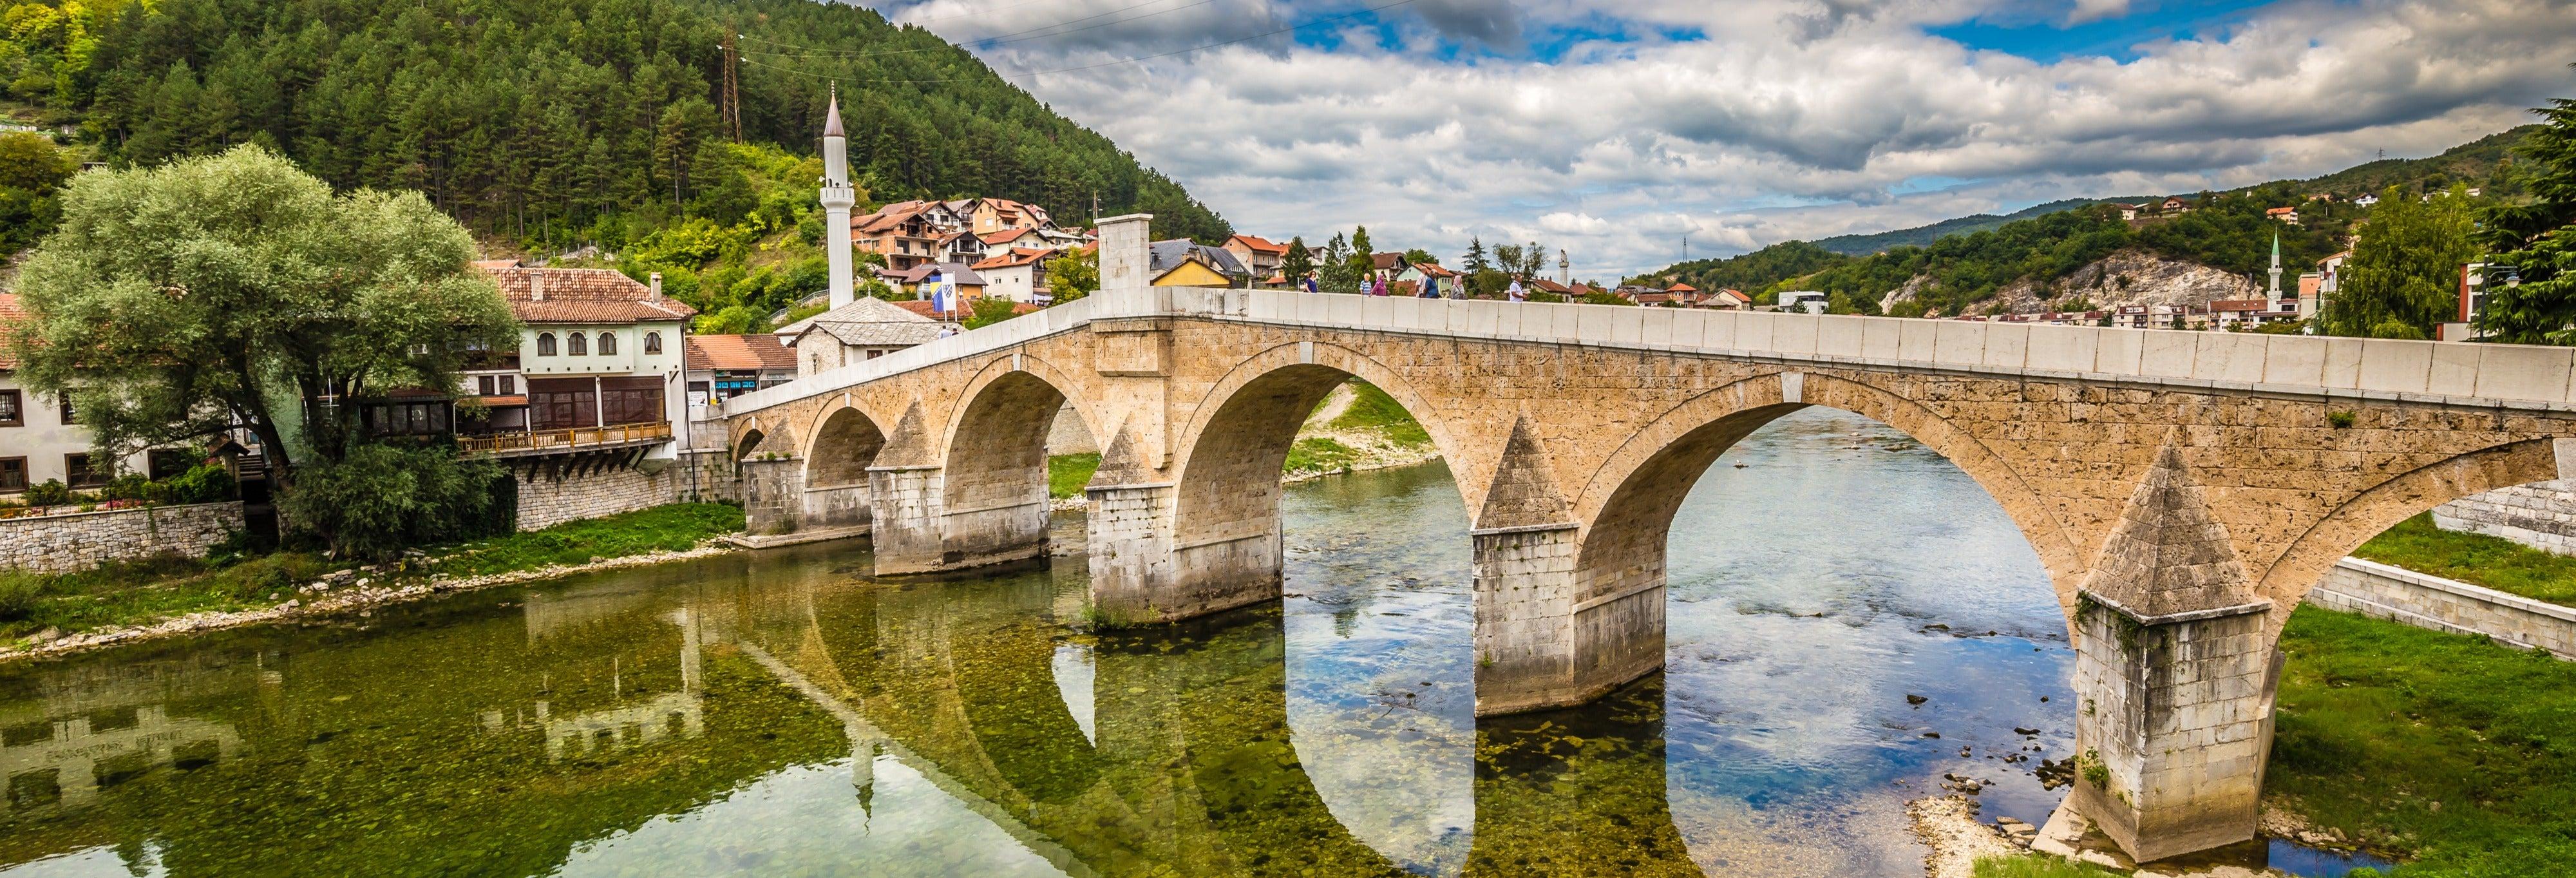 Excursion à Konjic, Radimlja et Počitelj